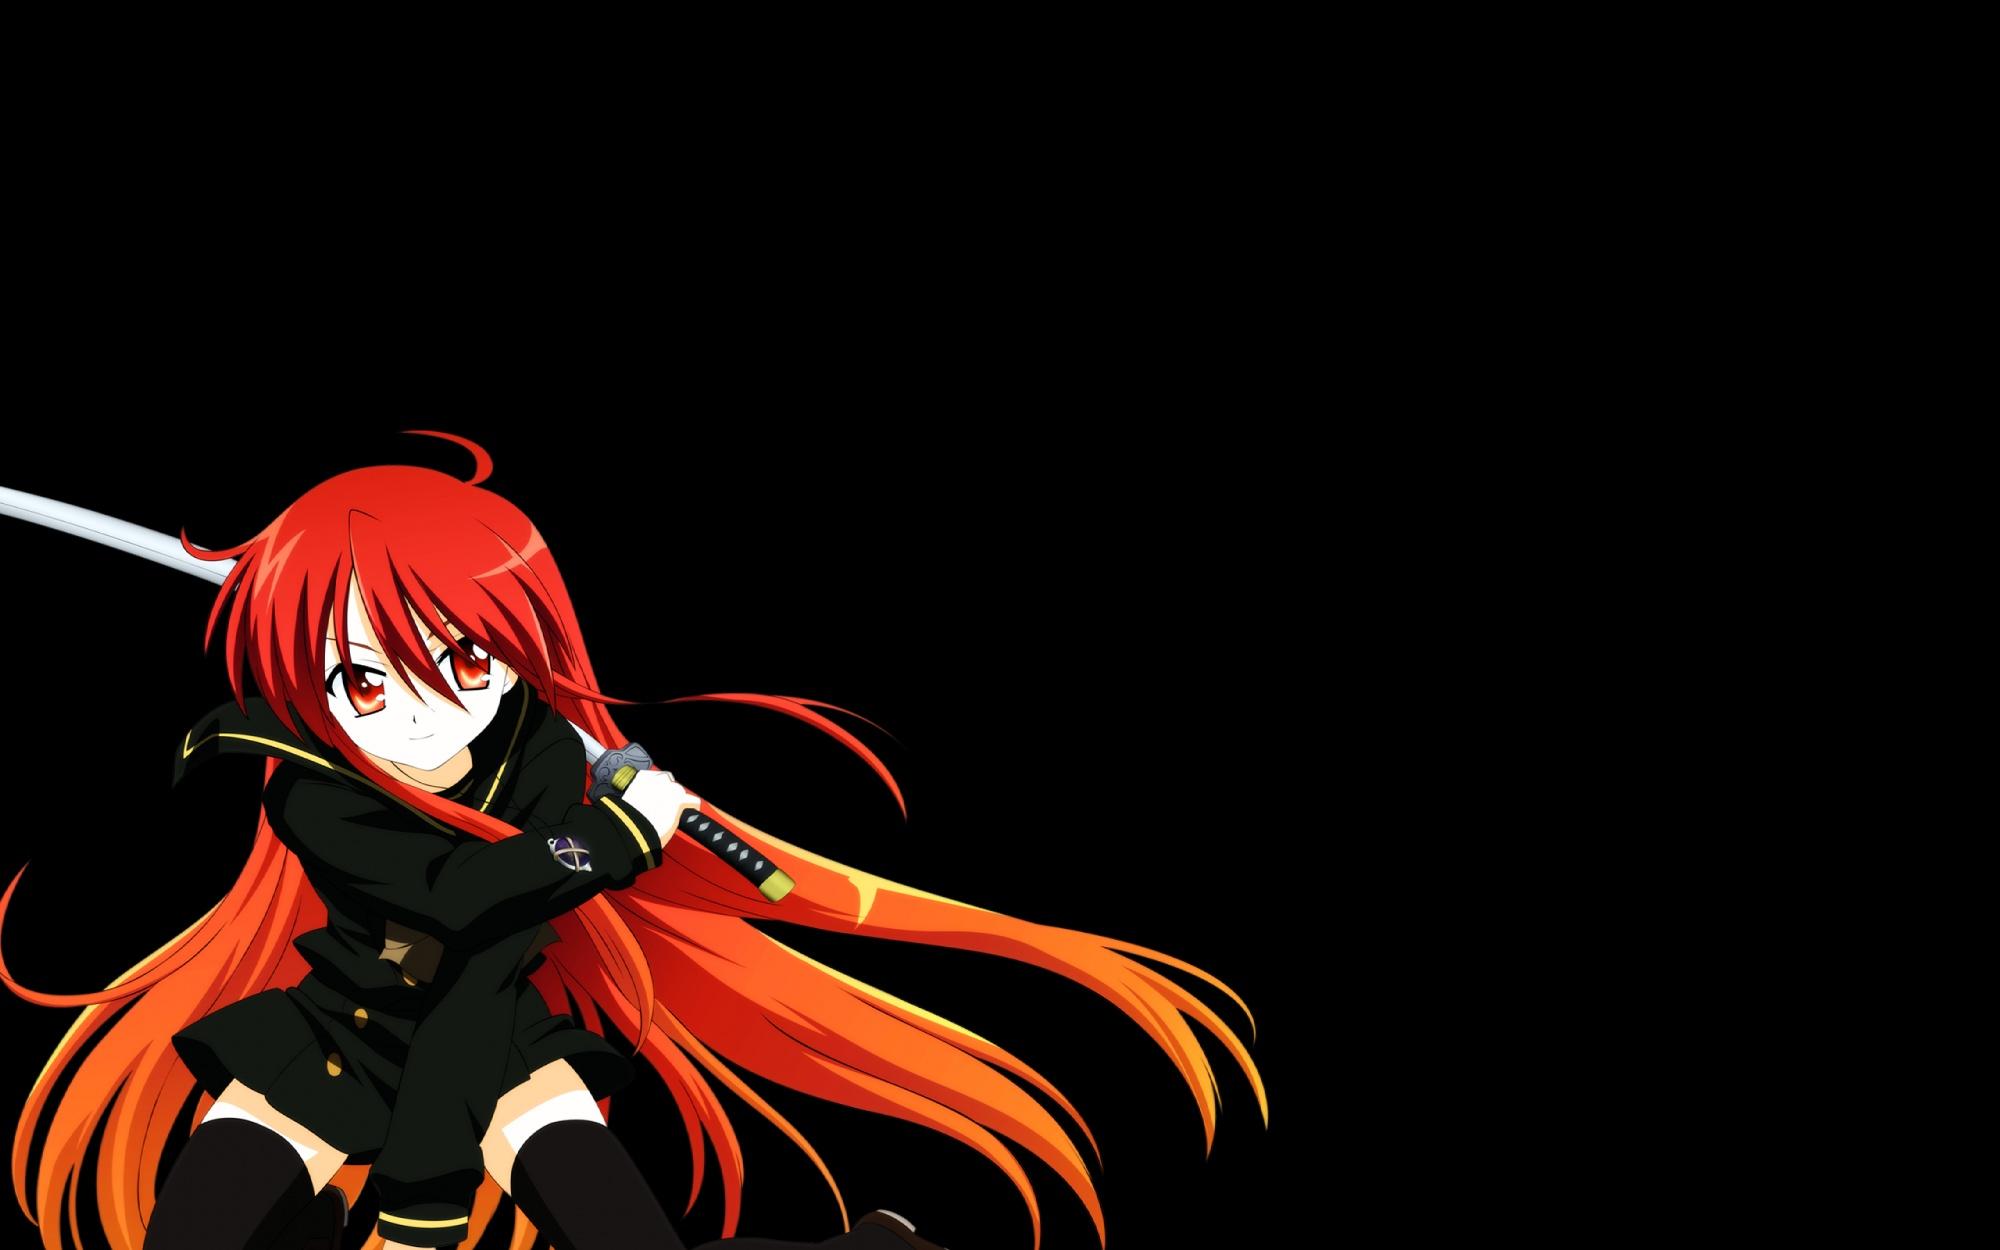 black shakugan_no_shana shana sword weapon